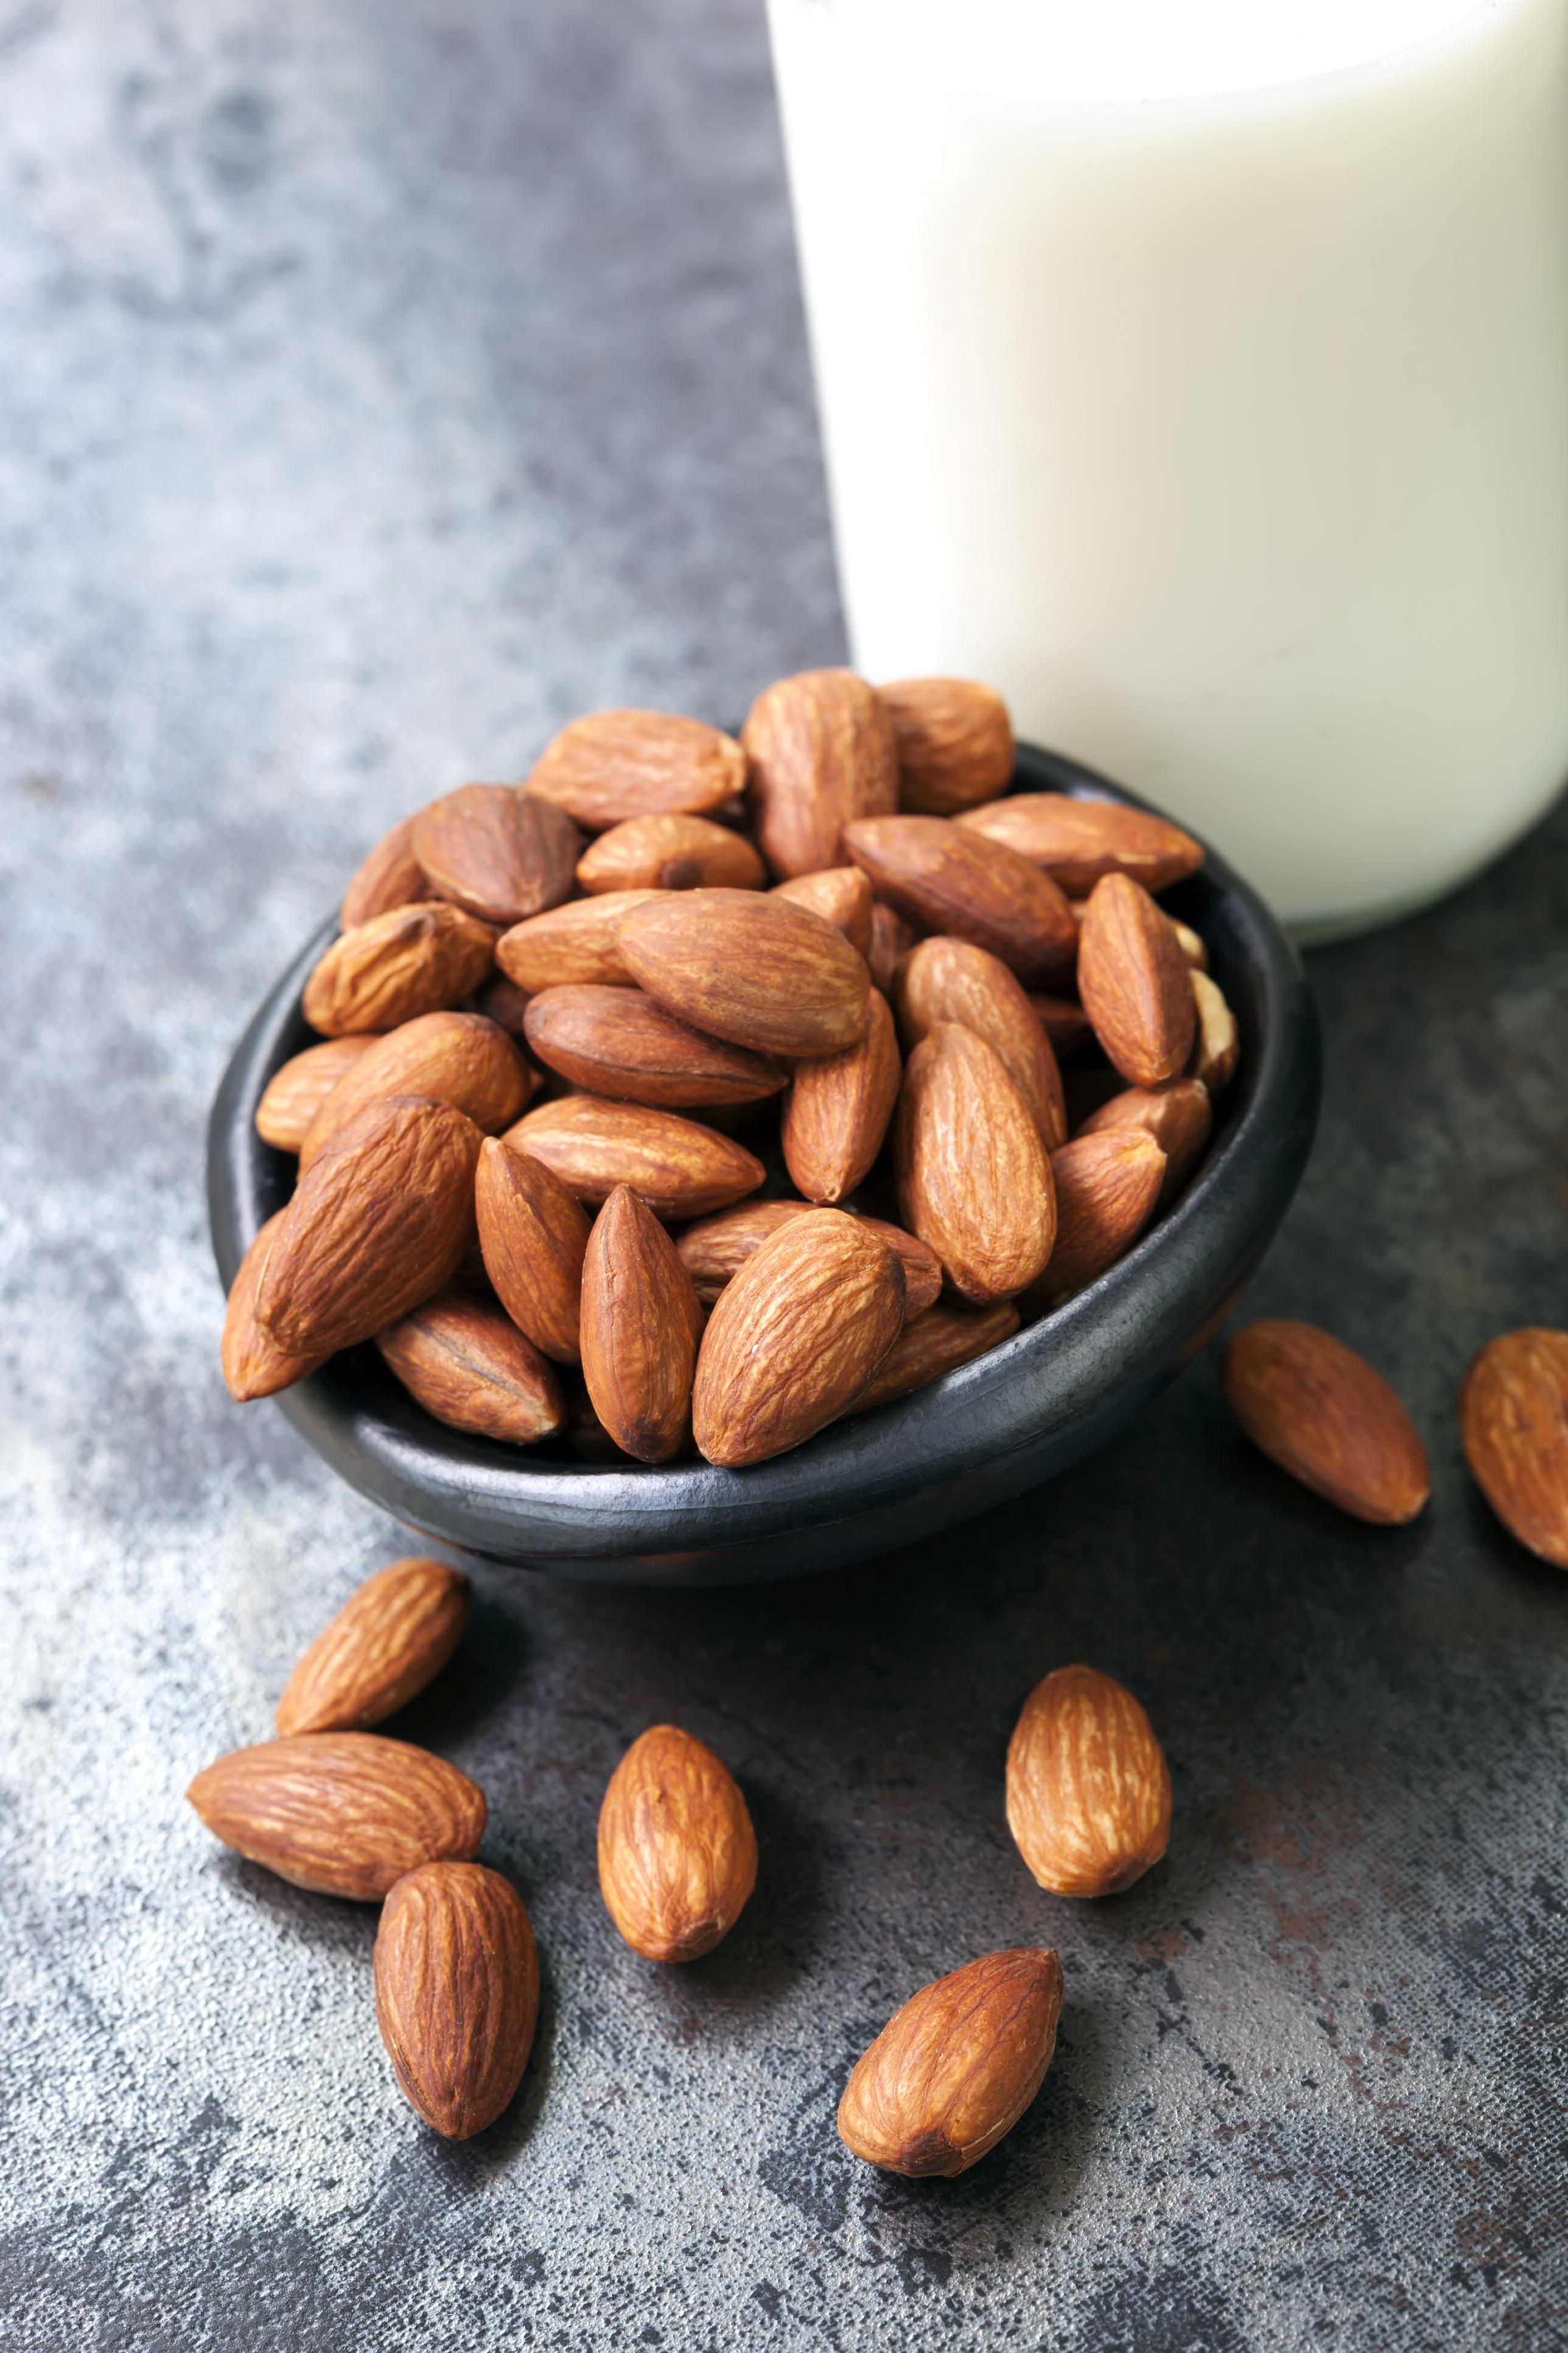 Almonds with almond milk, on dark slate background.